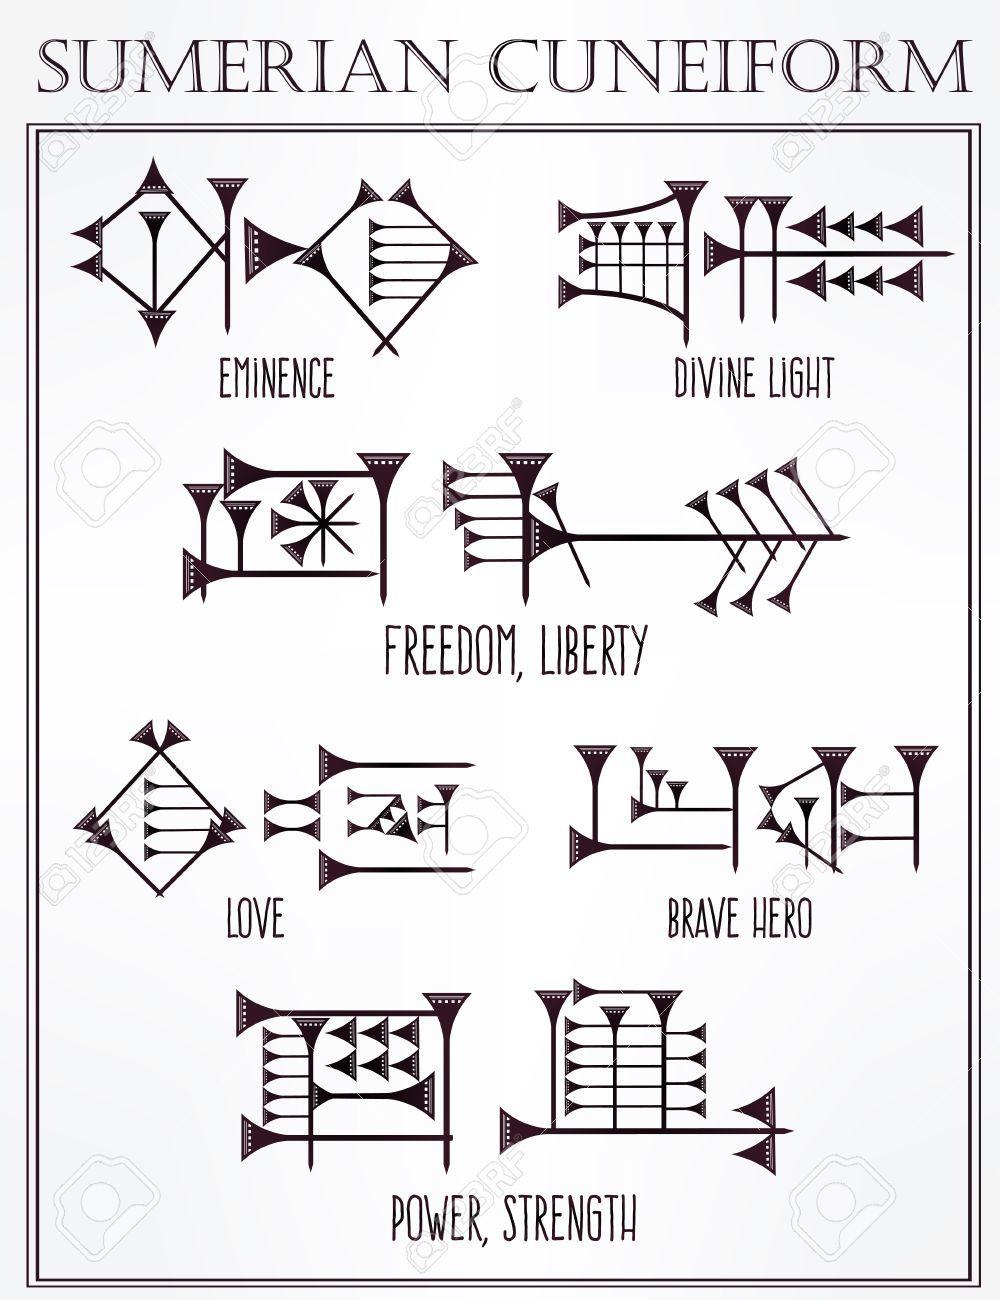 Related Image Art Pinterest Sumerian Ancient Symbols And Symbols